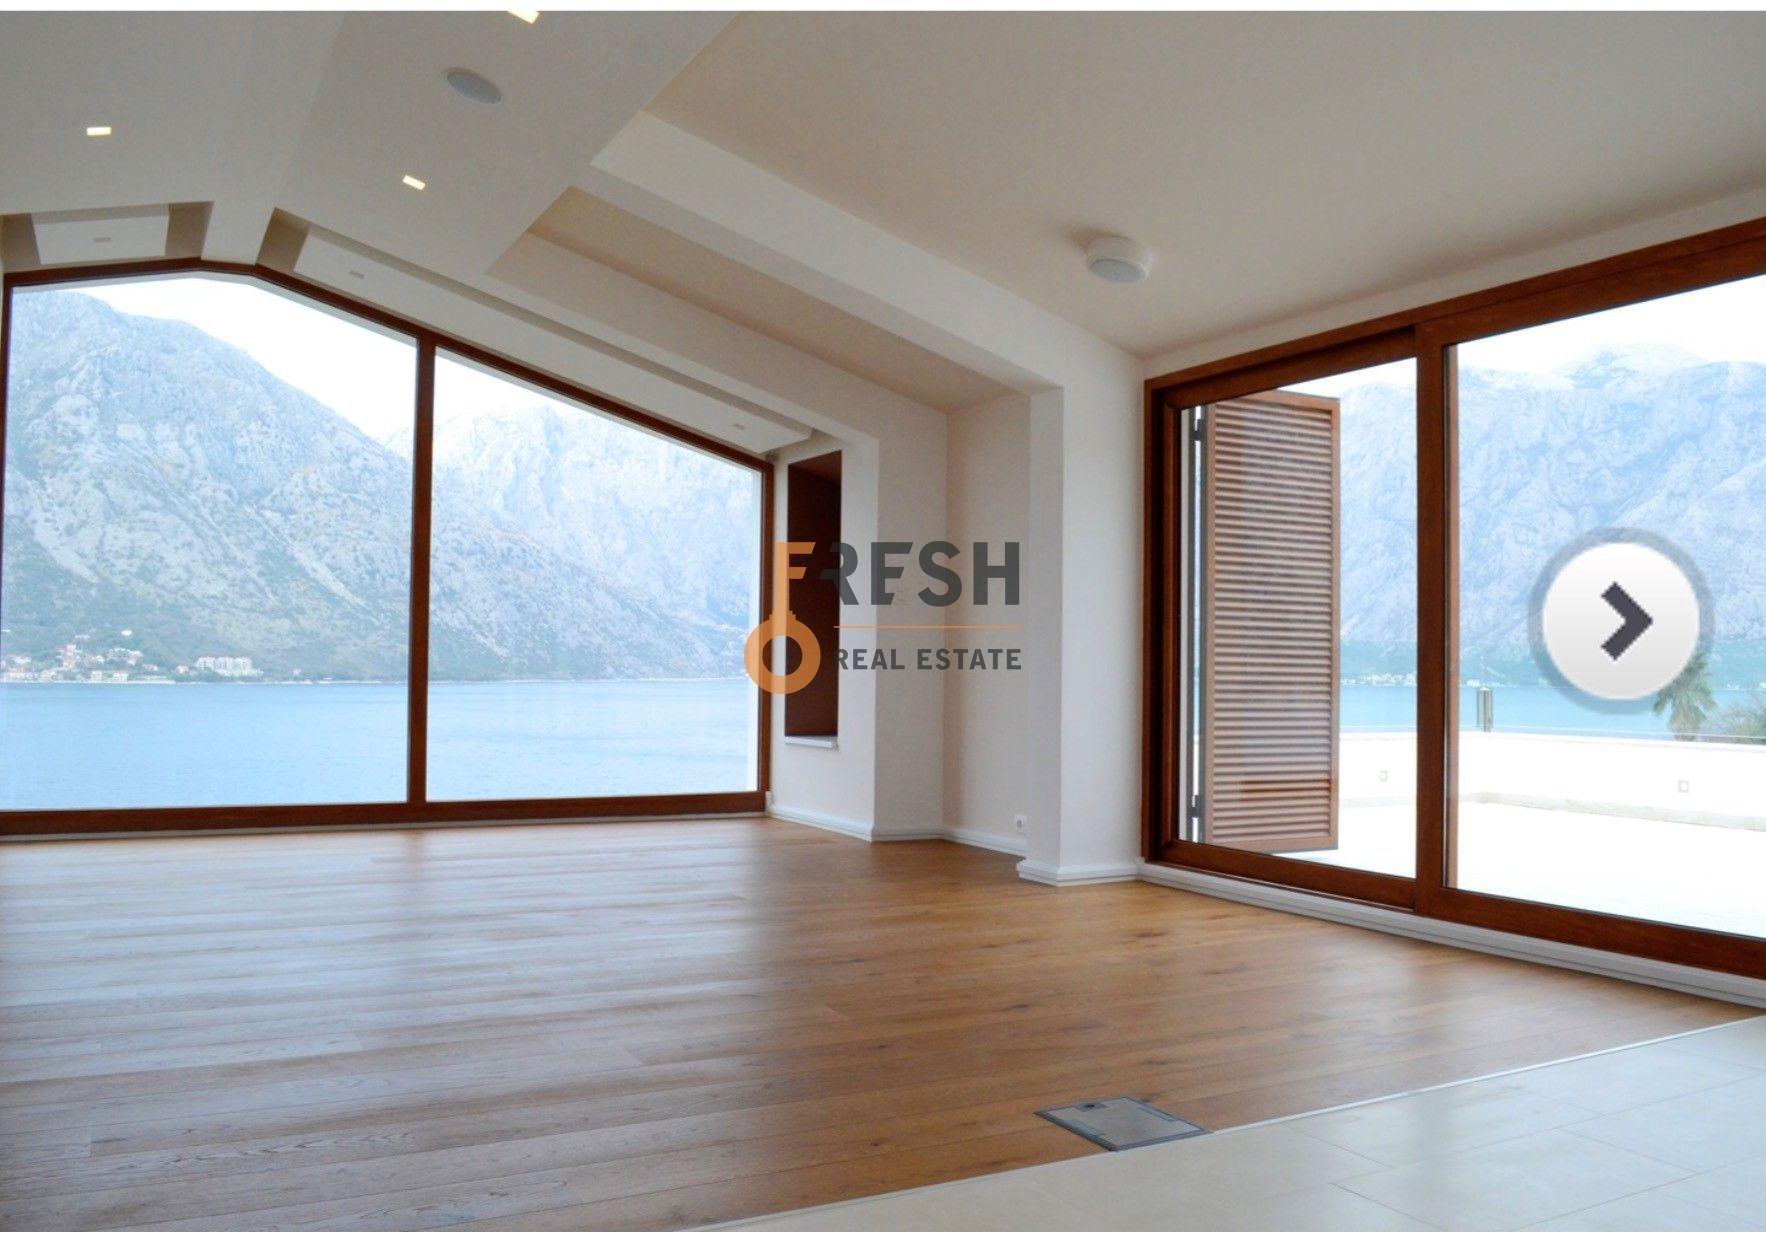 Luksuzna Villa u Boko-Kotorskom zalivu, 585,60 m2+400 m2 zemljista, Prodaja - 19